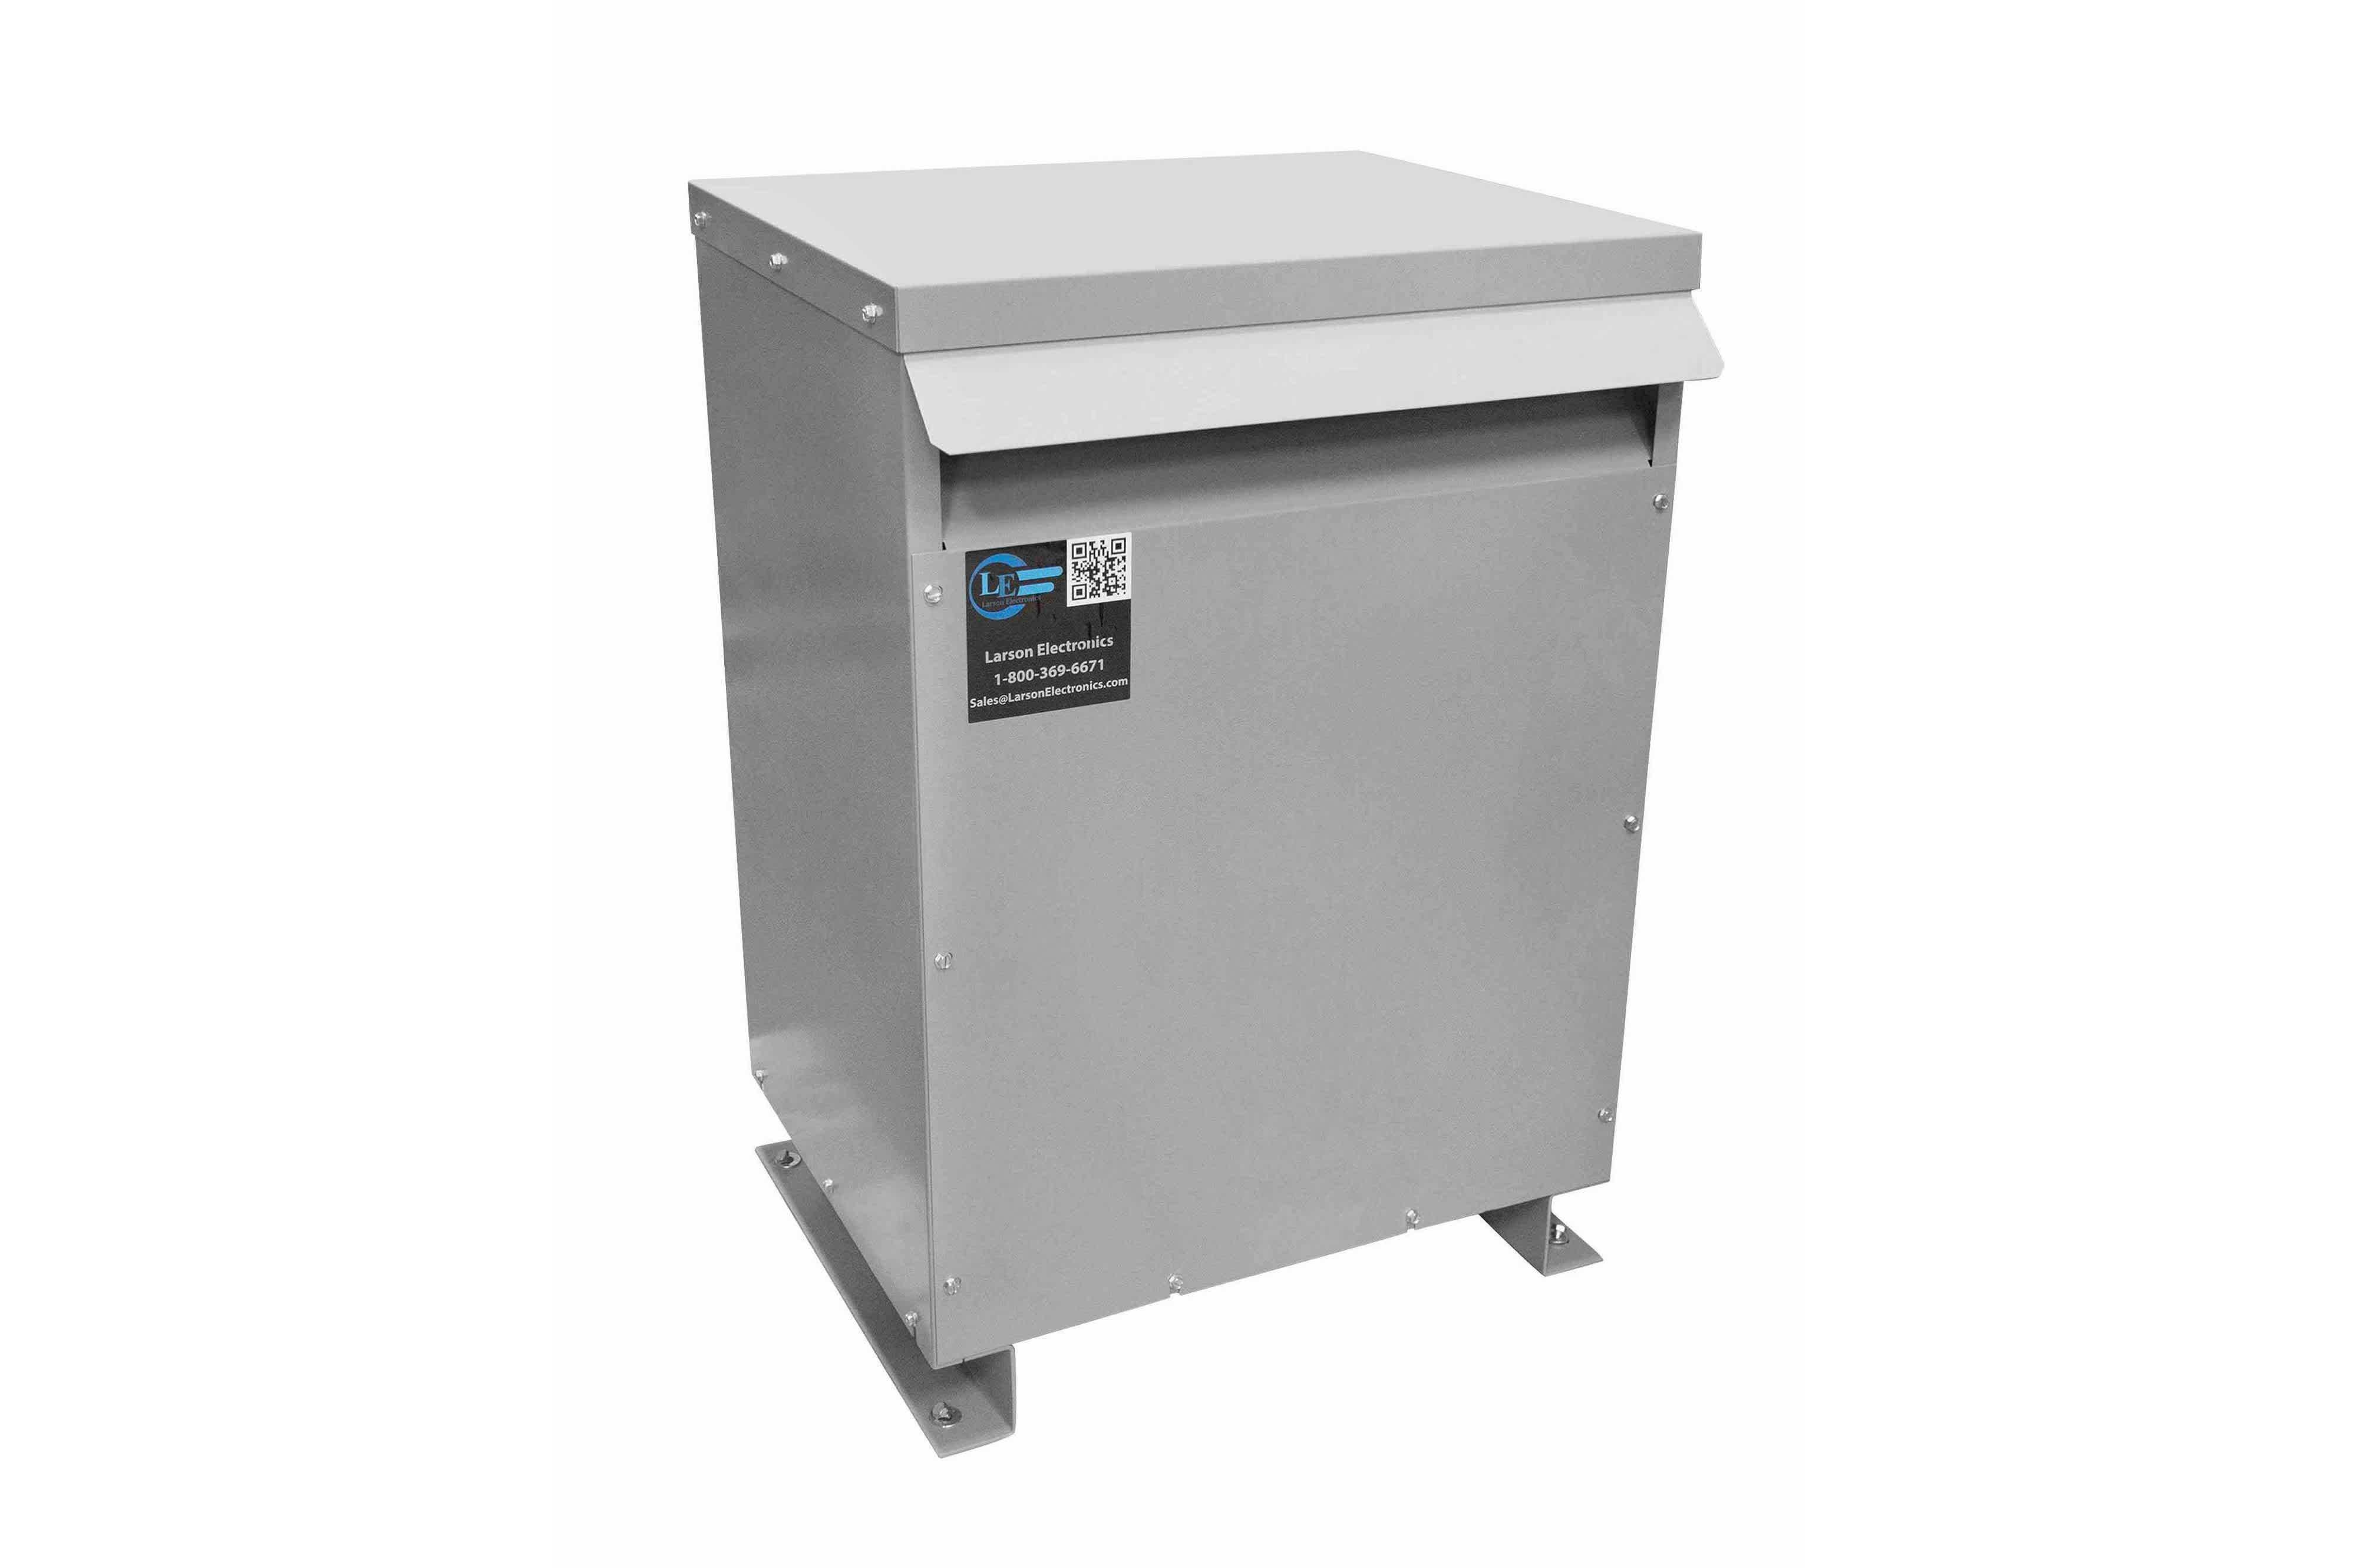 1000 kVA 3PH DOE Transformer, 480V Delta Primary, 575Y/332 Wye-N Secondary, N3R, Ventilated, 60 Hz